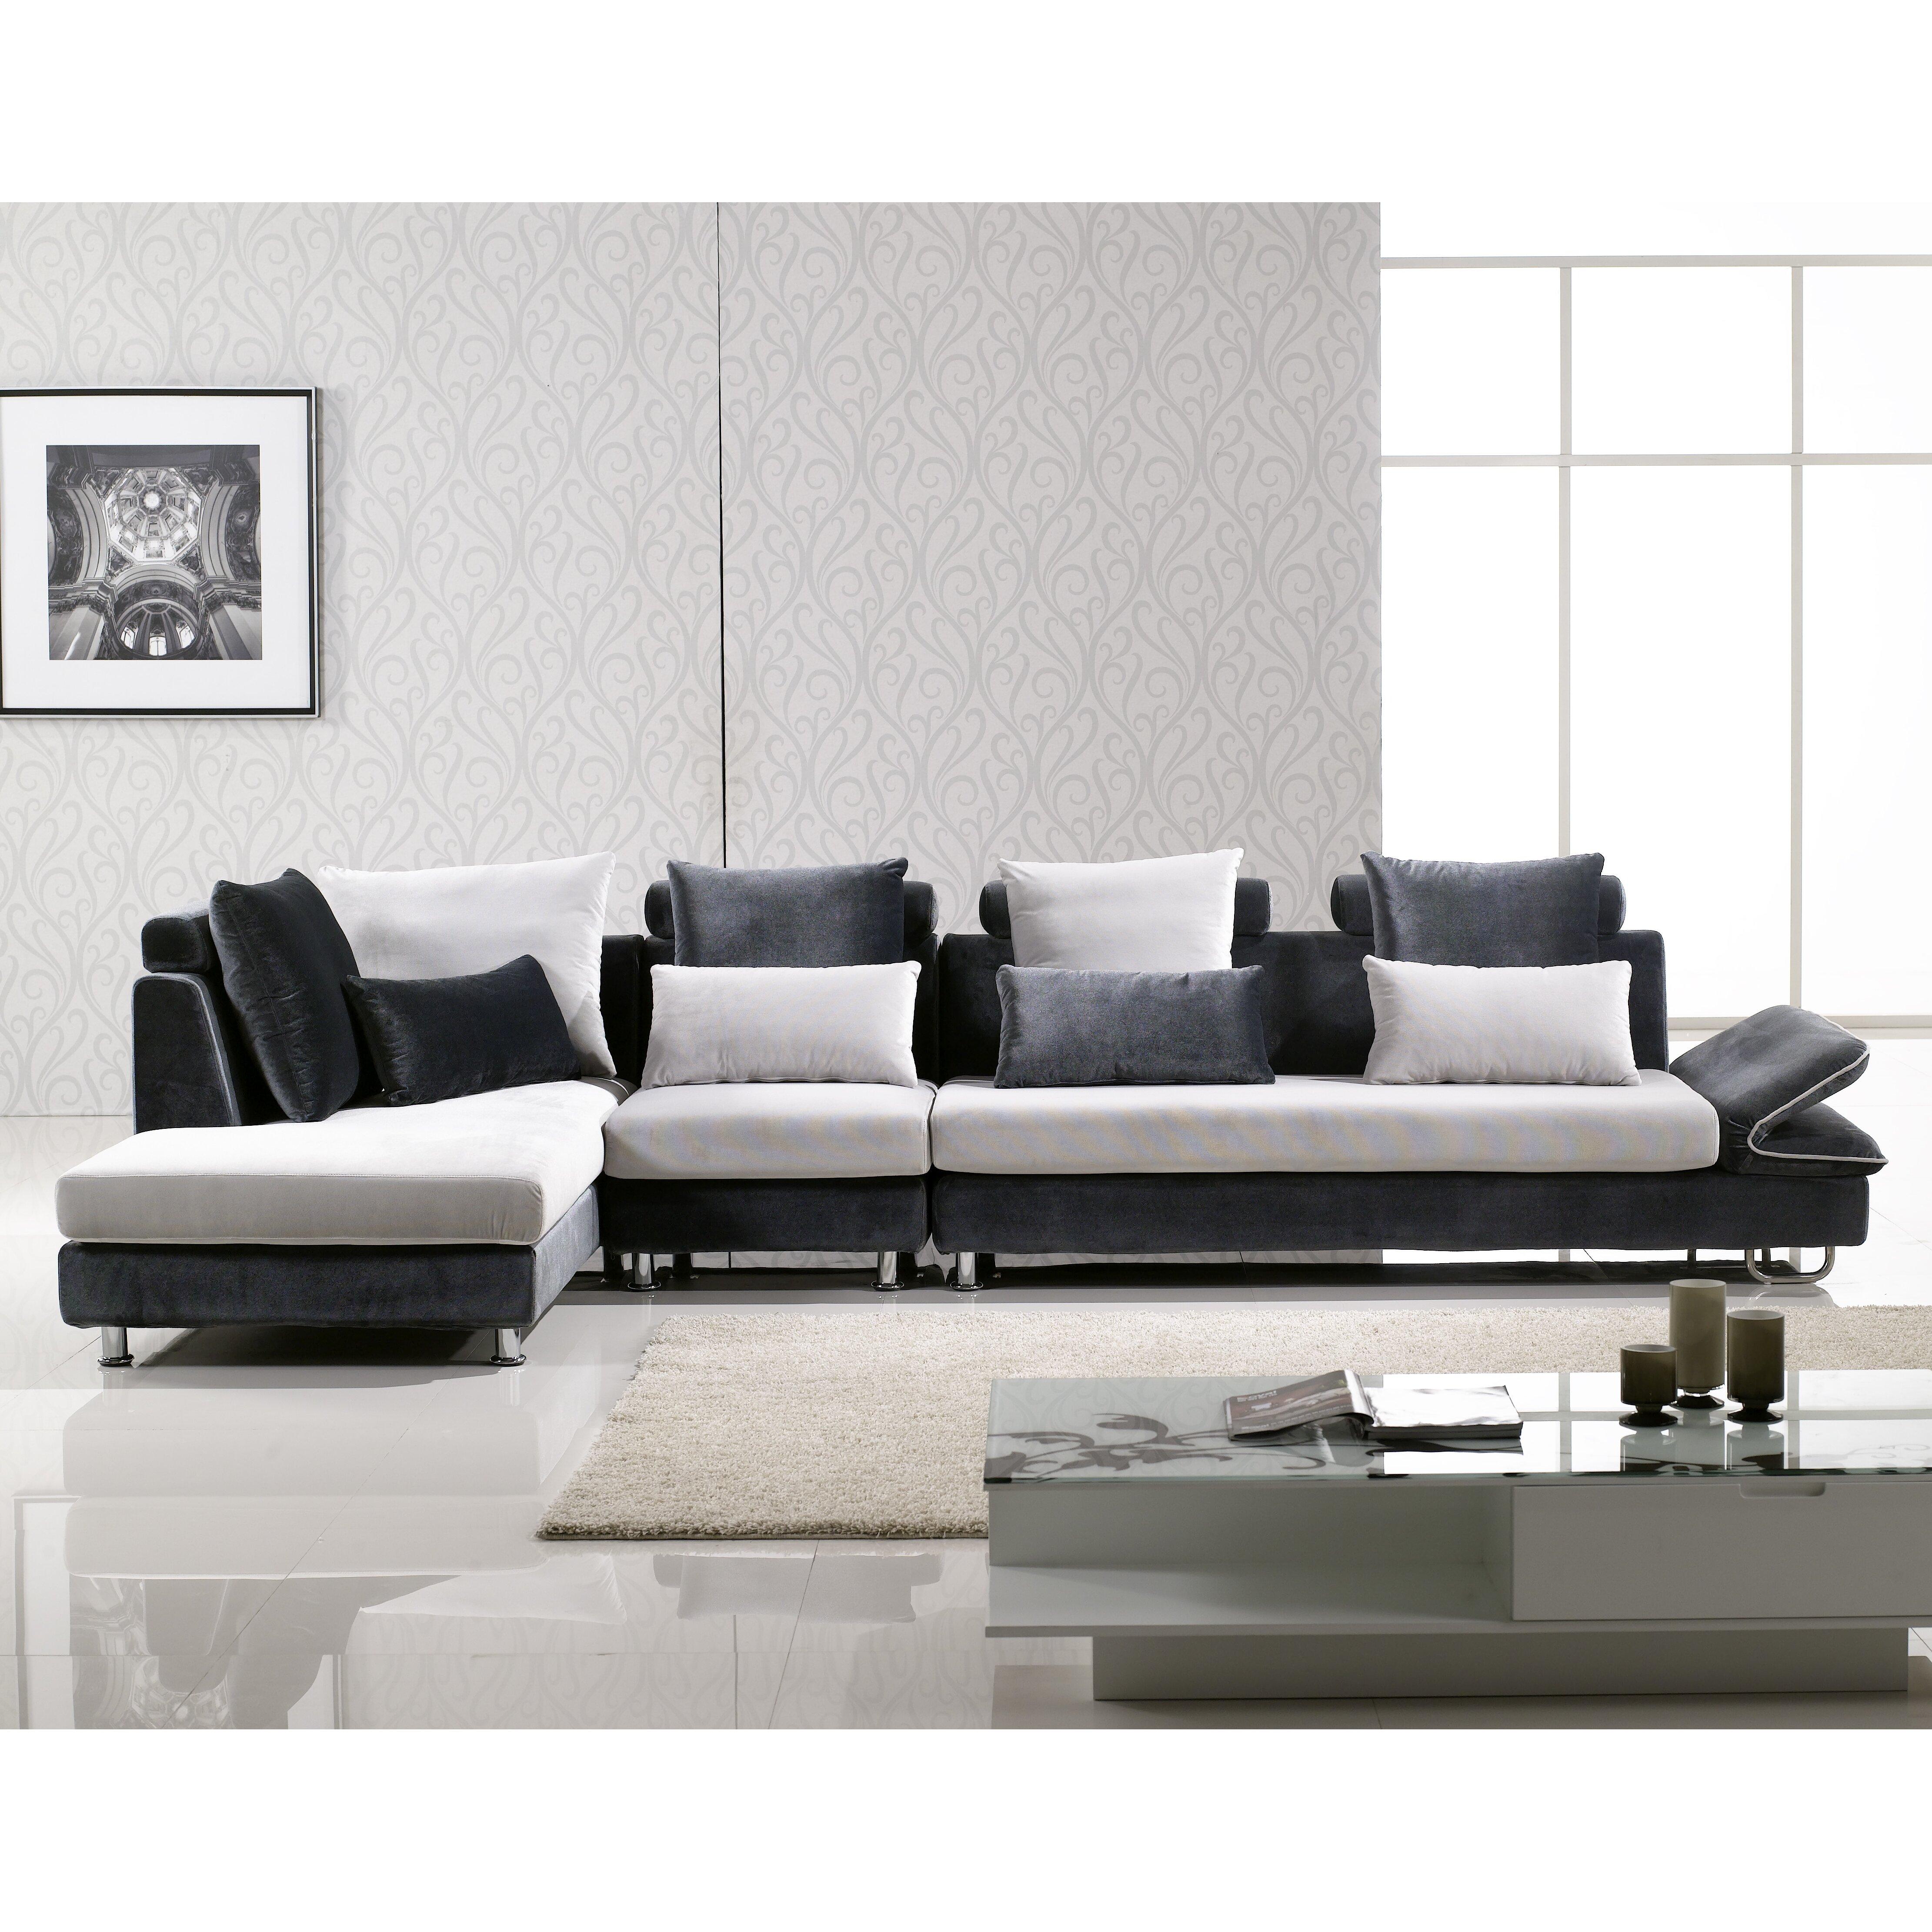 Hokku designs uptown sectional reviews wayfair for Hokku designs living room furniture